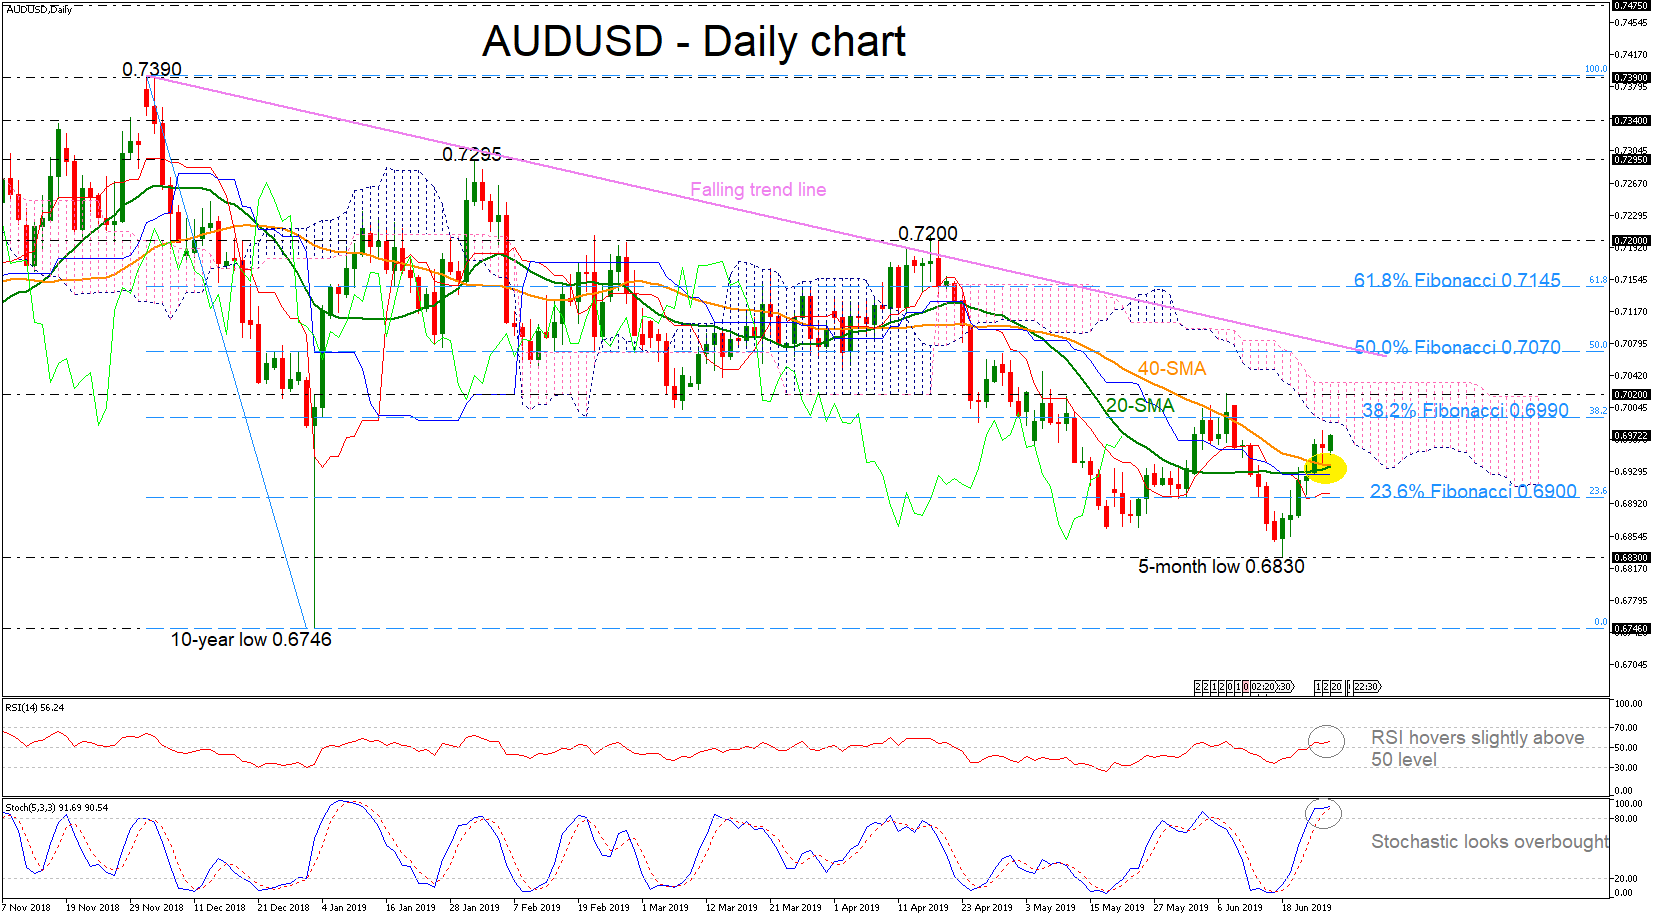 AUDUSD tops moving averages but indicators move sideways